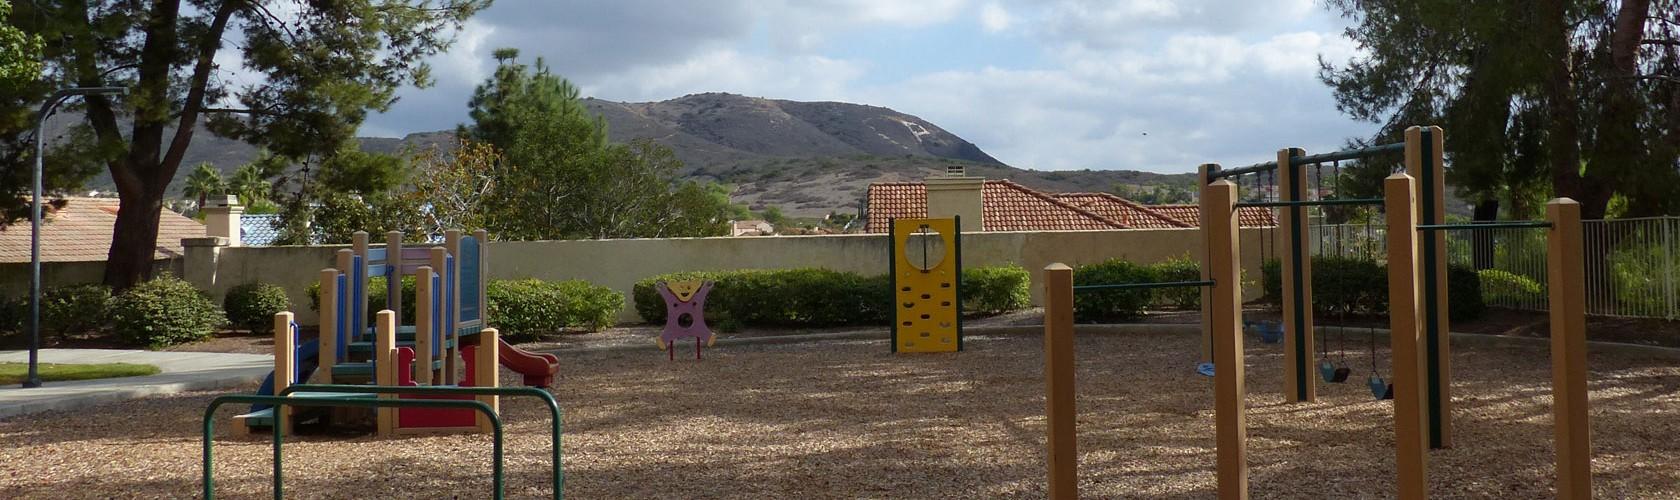 Santa-Fe-Hills-Parks